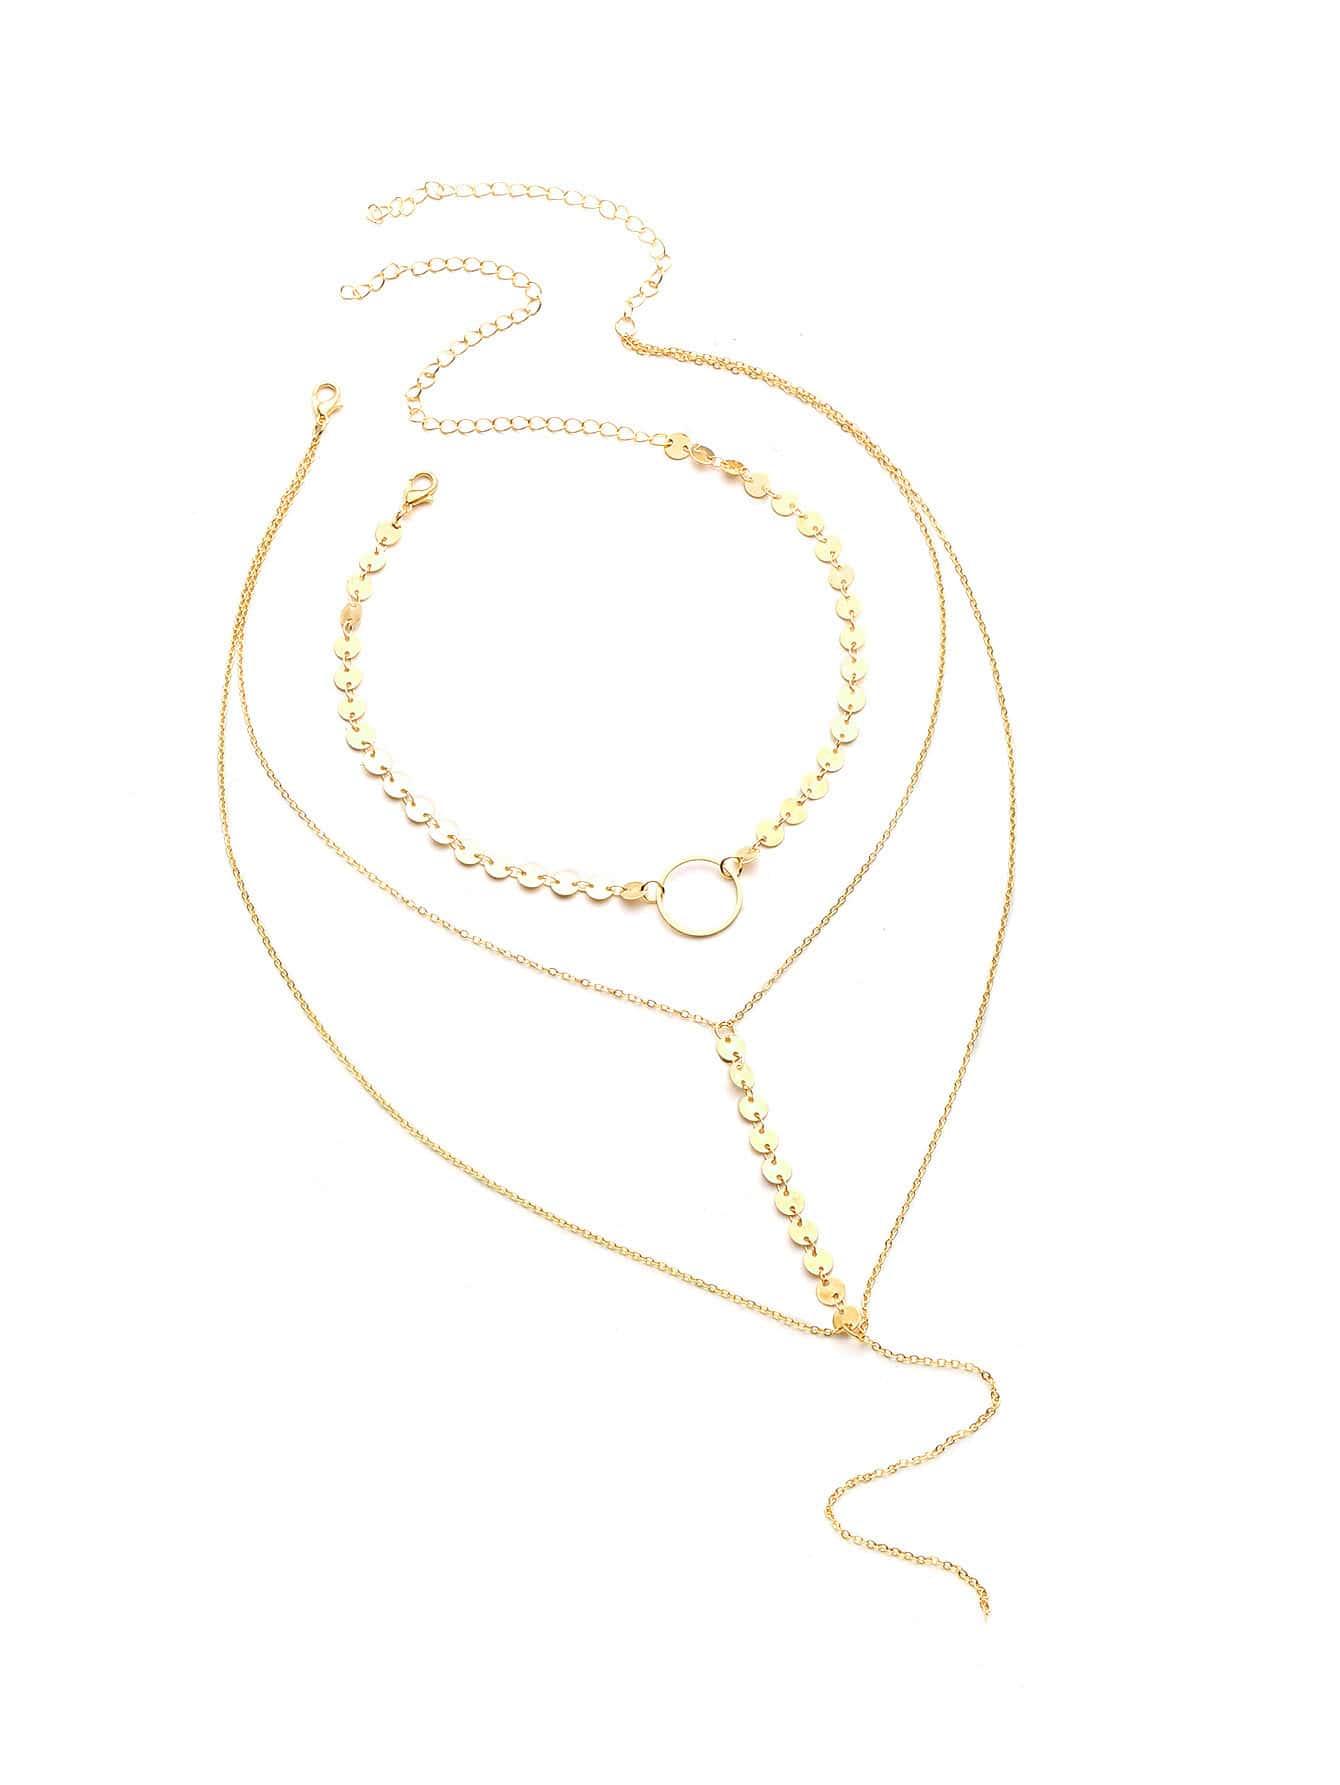 Фото Sequin Decorated Layered Y Necklace With Choker. Купить с доставкой